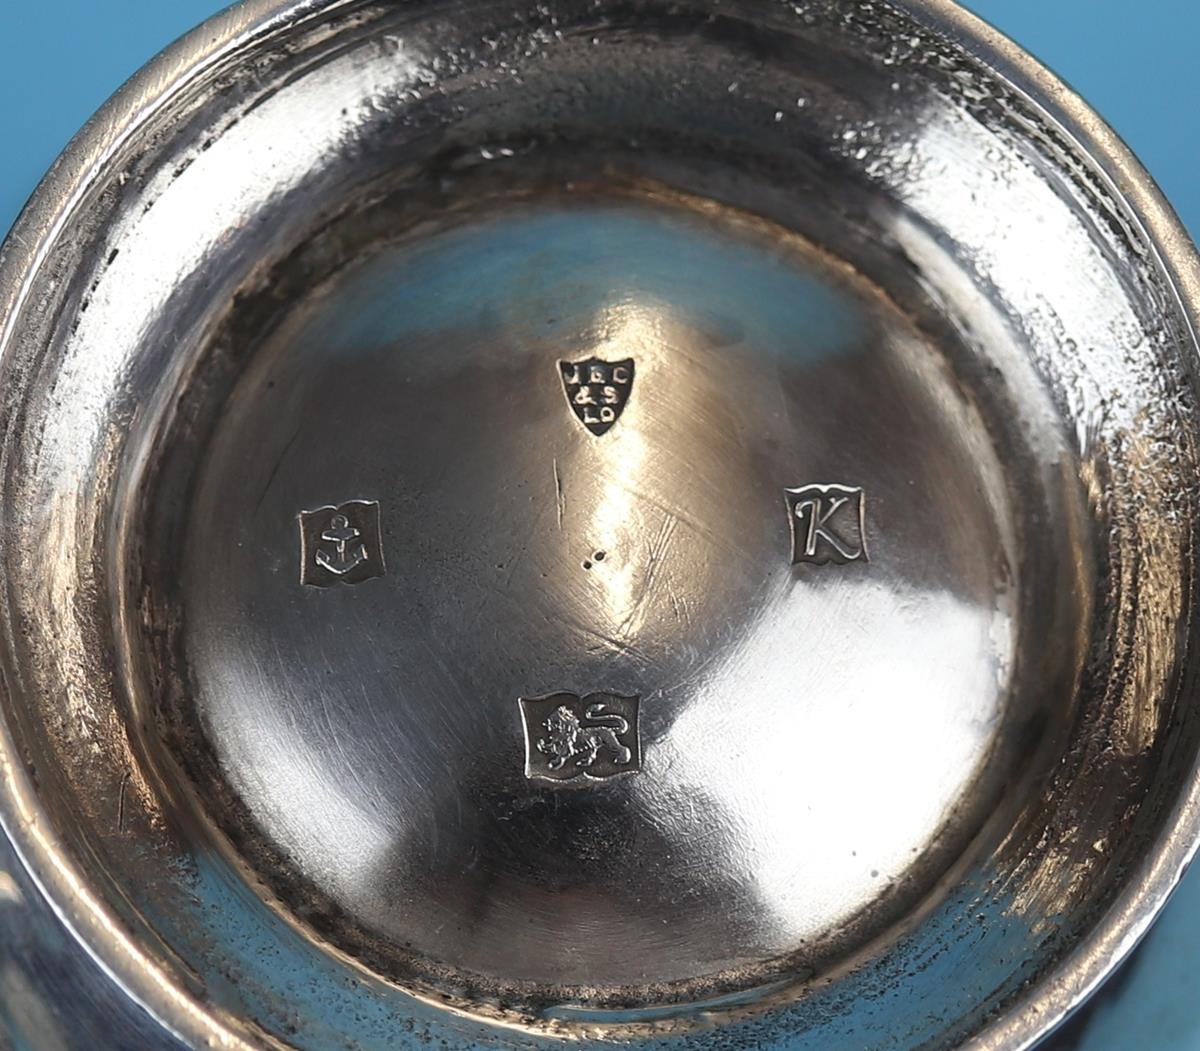 Hallmarked silver sugar bowl & cream jug - Birmingham - JBC & Sons Ltd - Approx weight 157g - Image 3 of 3